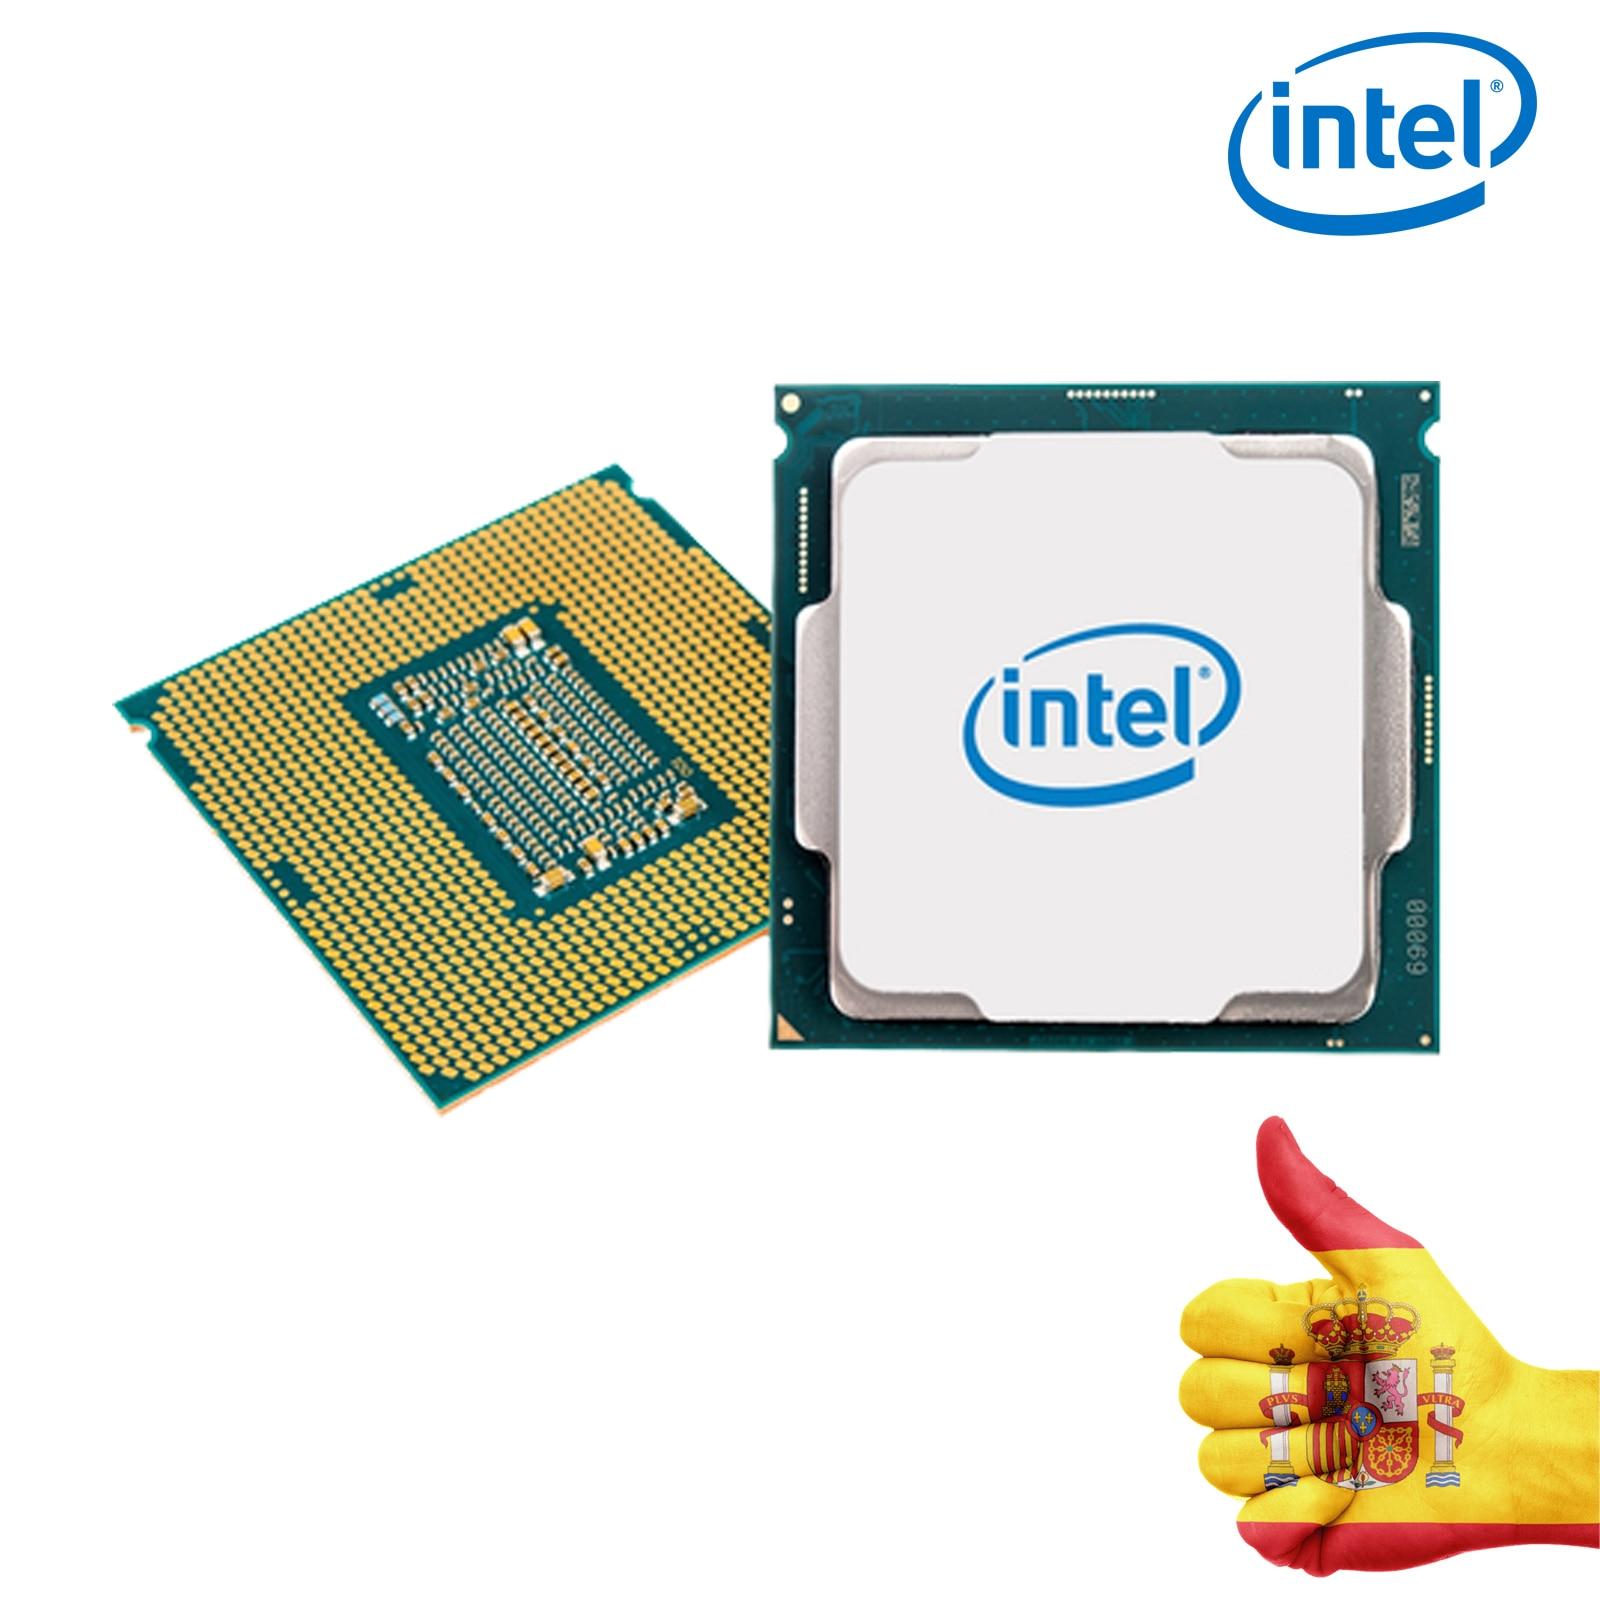 Intel Core I7-9700 3 GHZ BOX 12 MB SMART CACHE